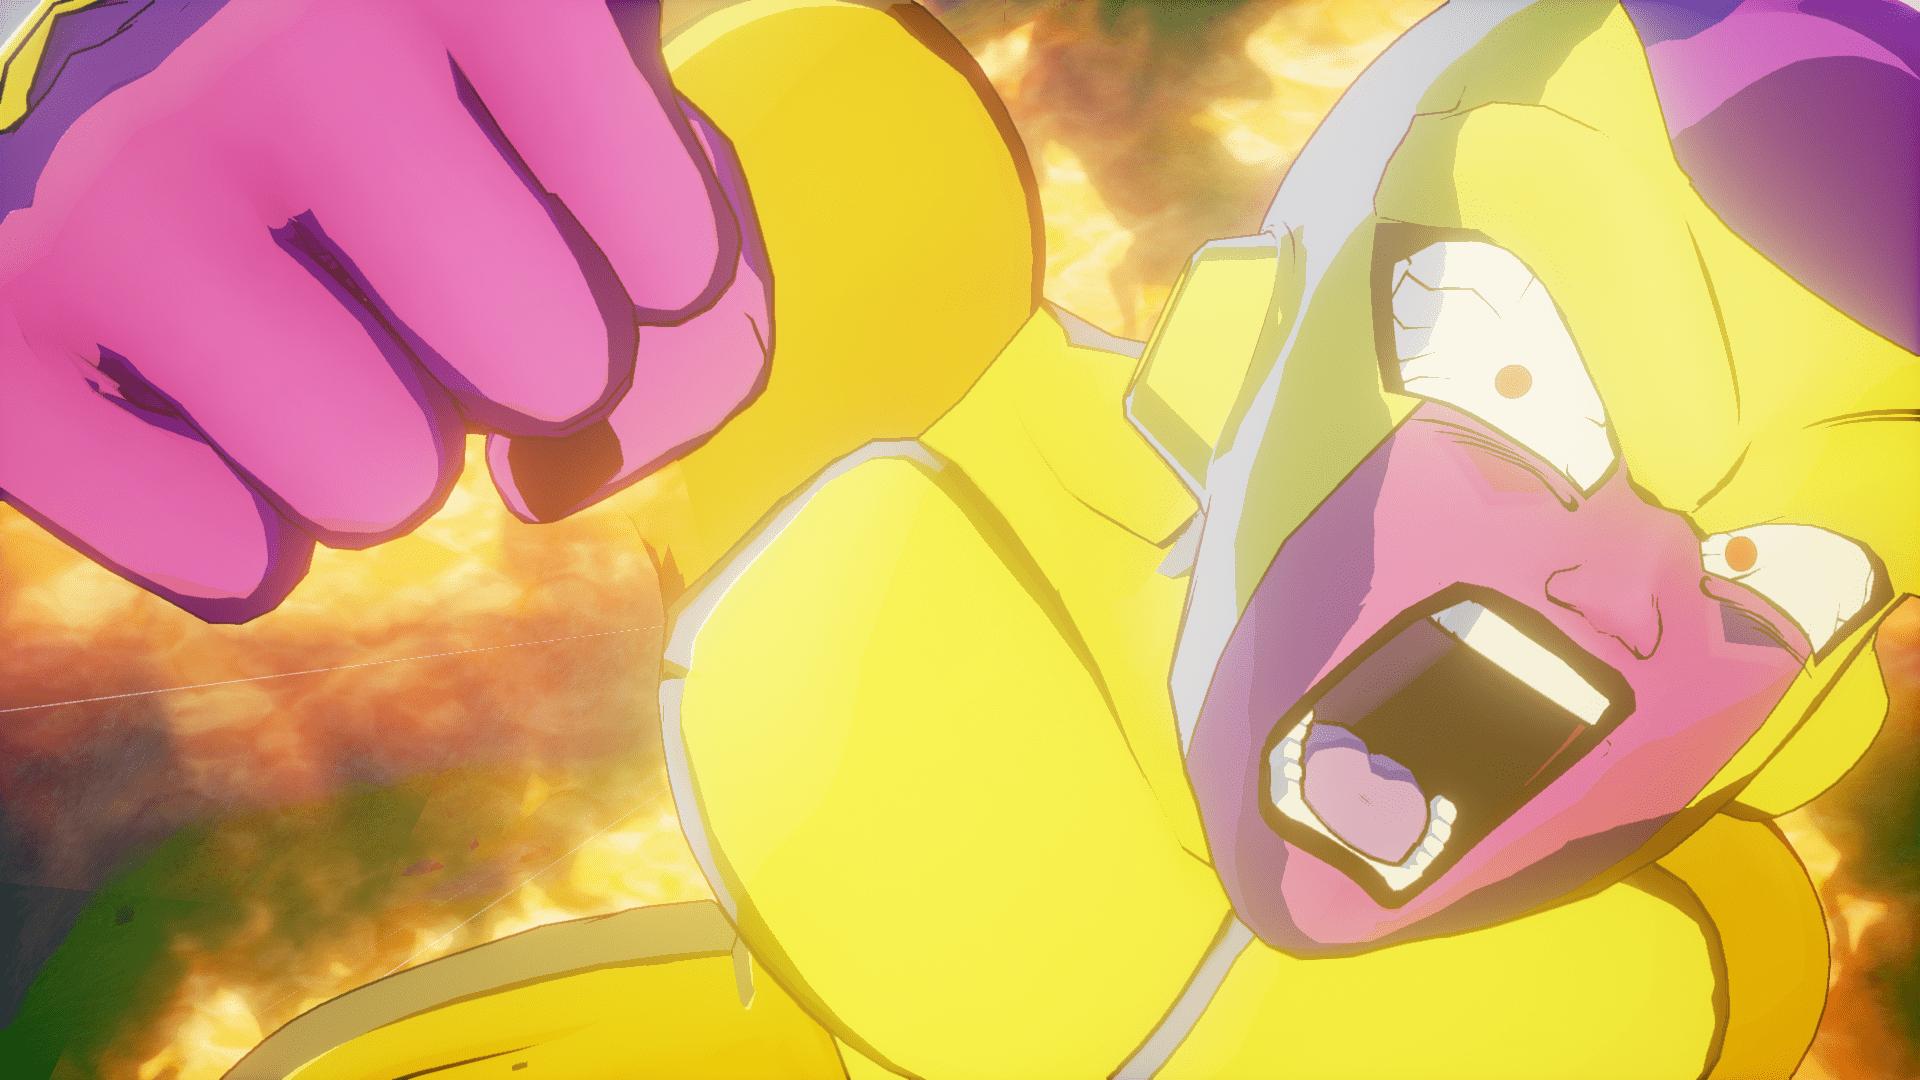 Frieza returns in Dragon Ball Z: Kakarot